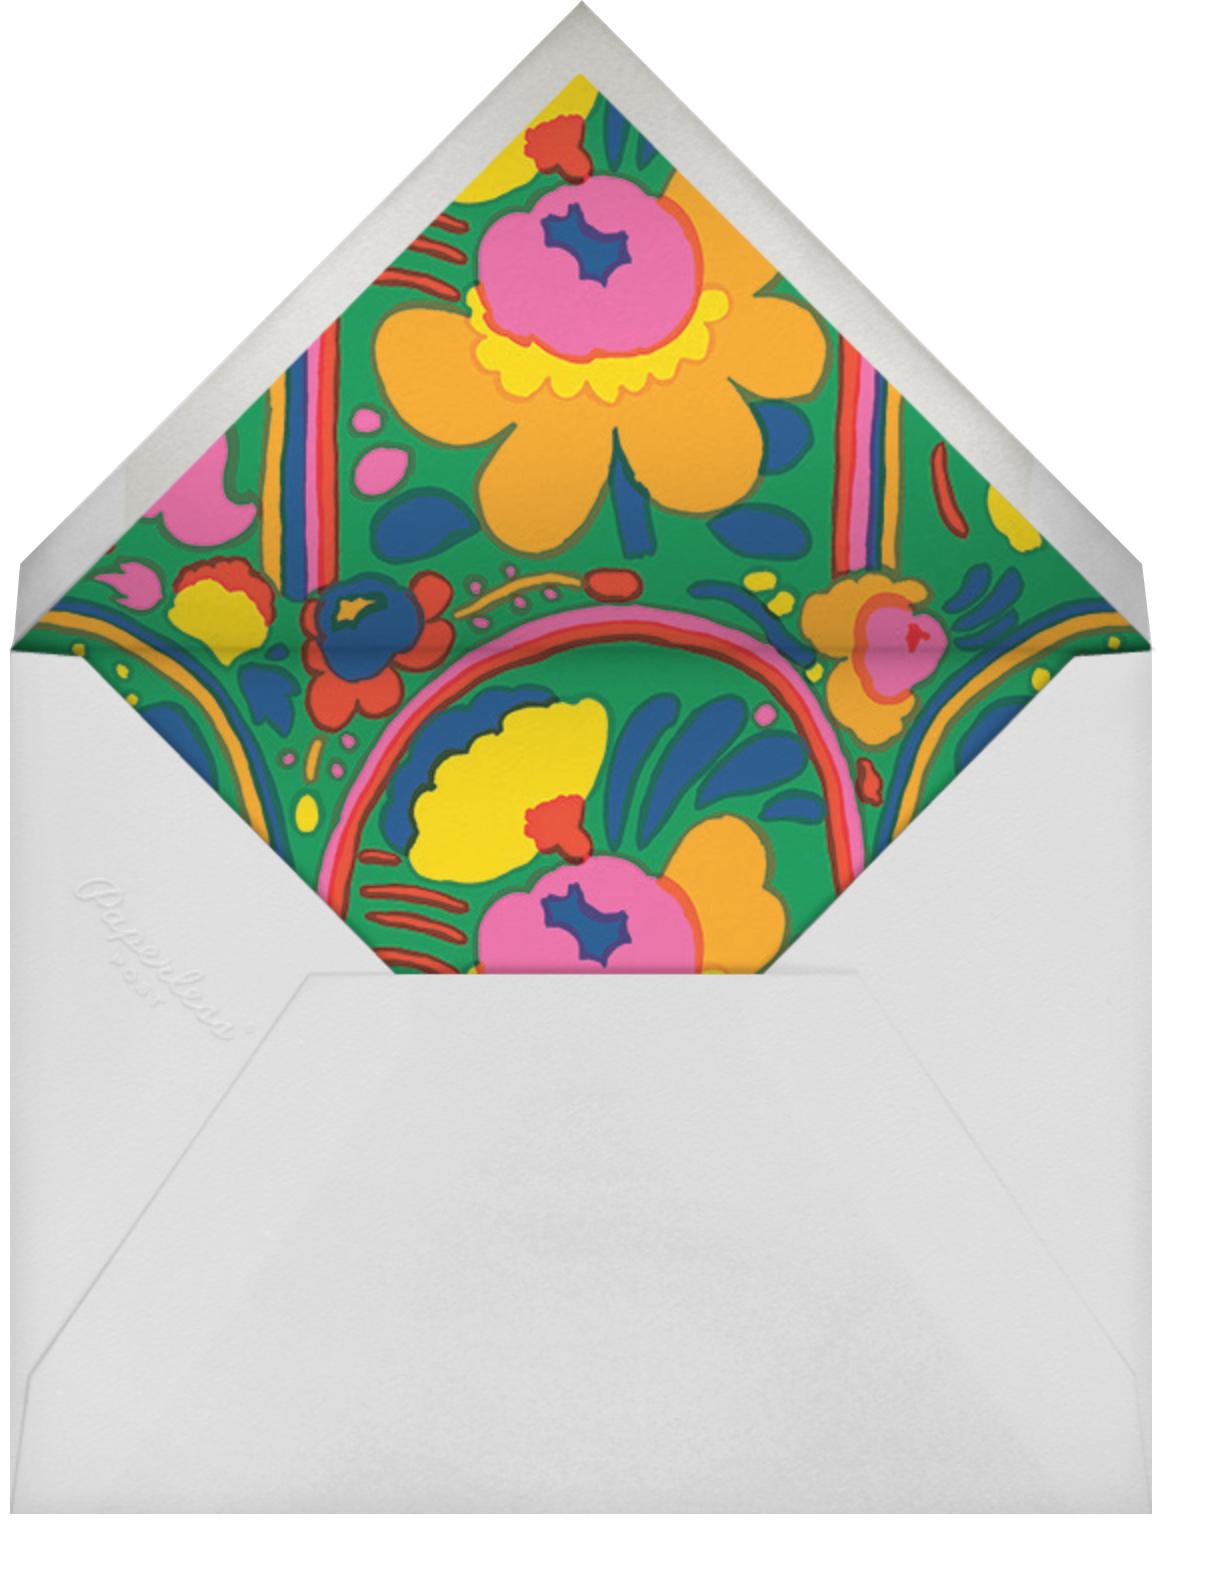 Pieni - Green - Marimekko - Adult birthday - envelope back